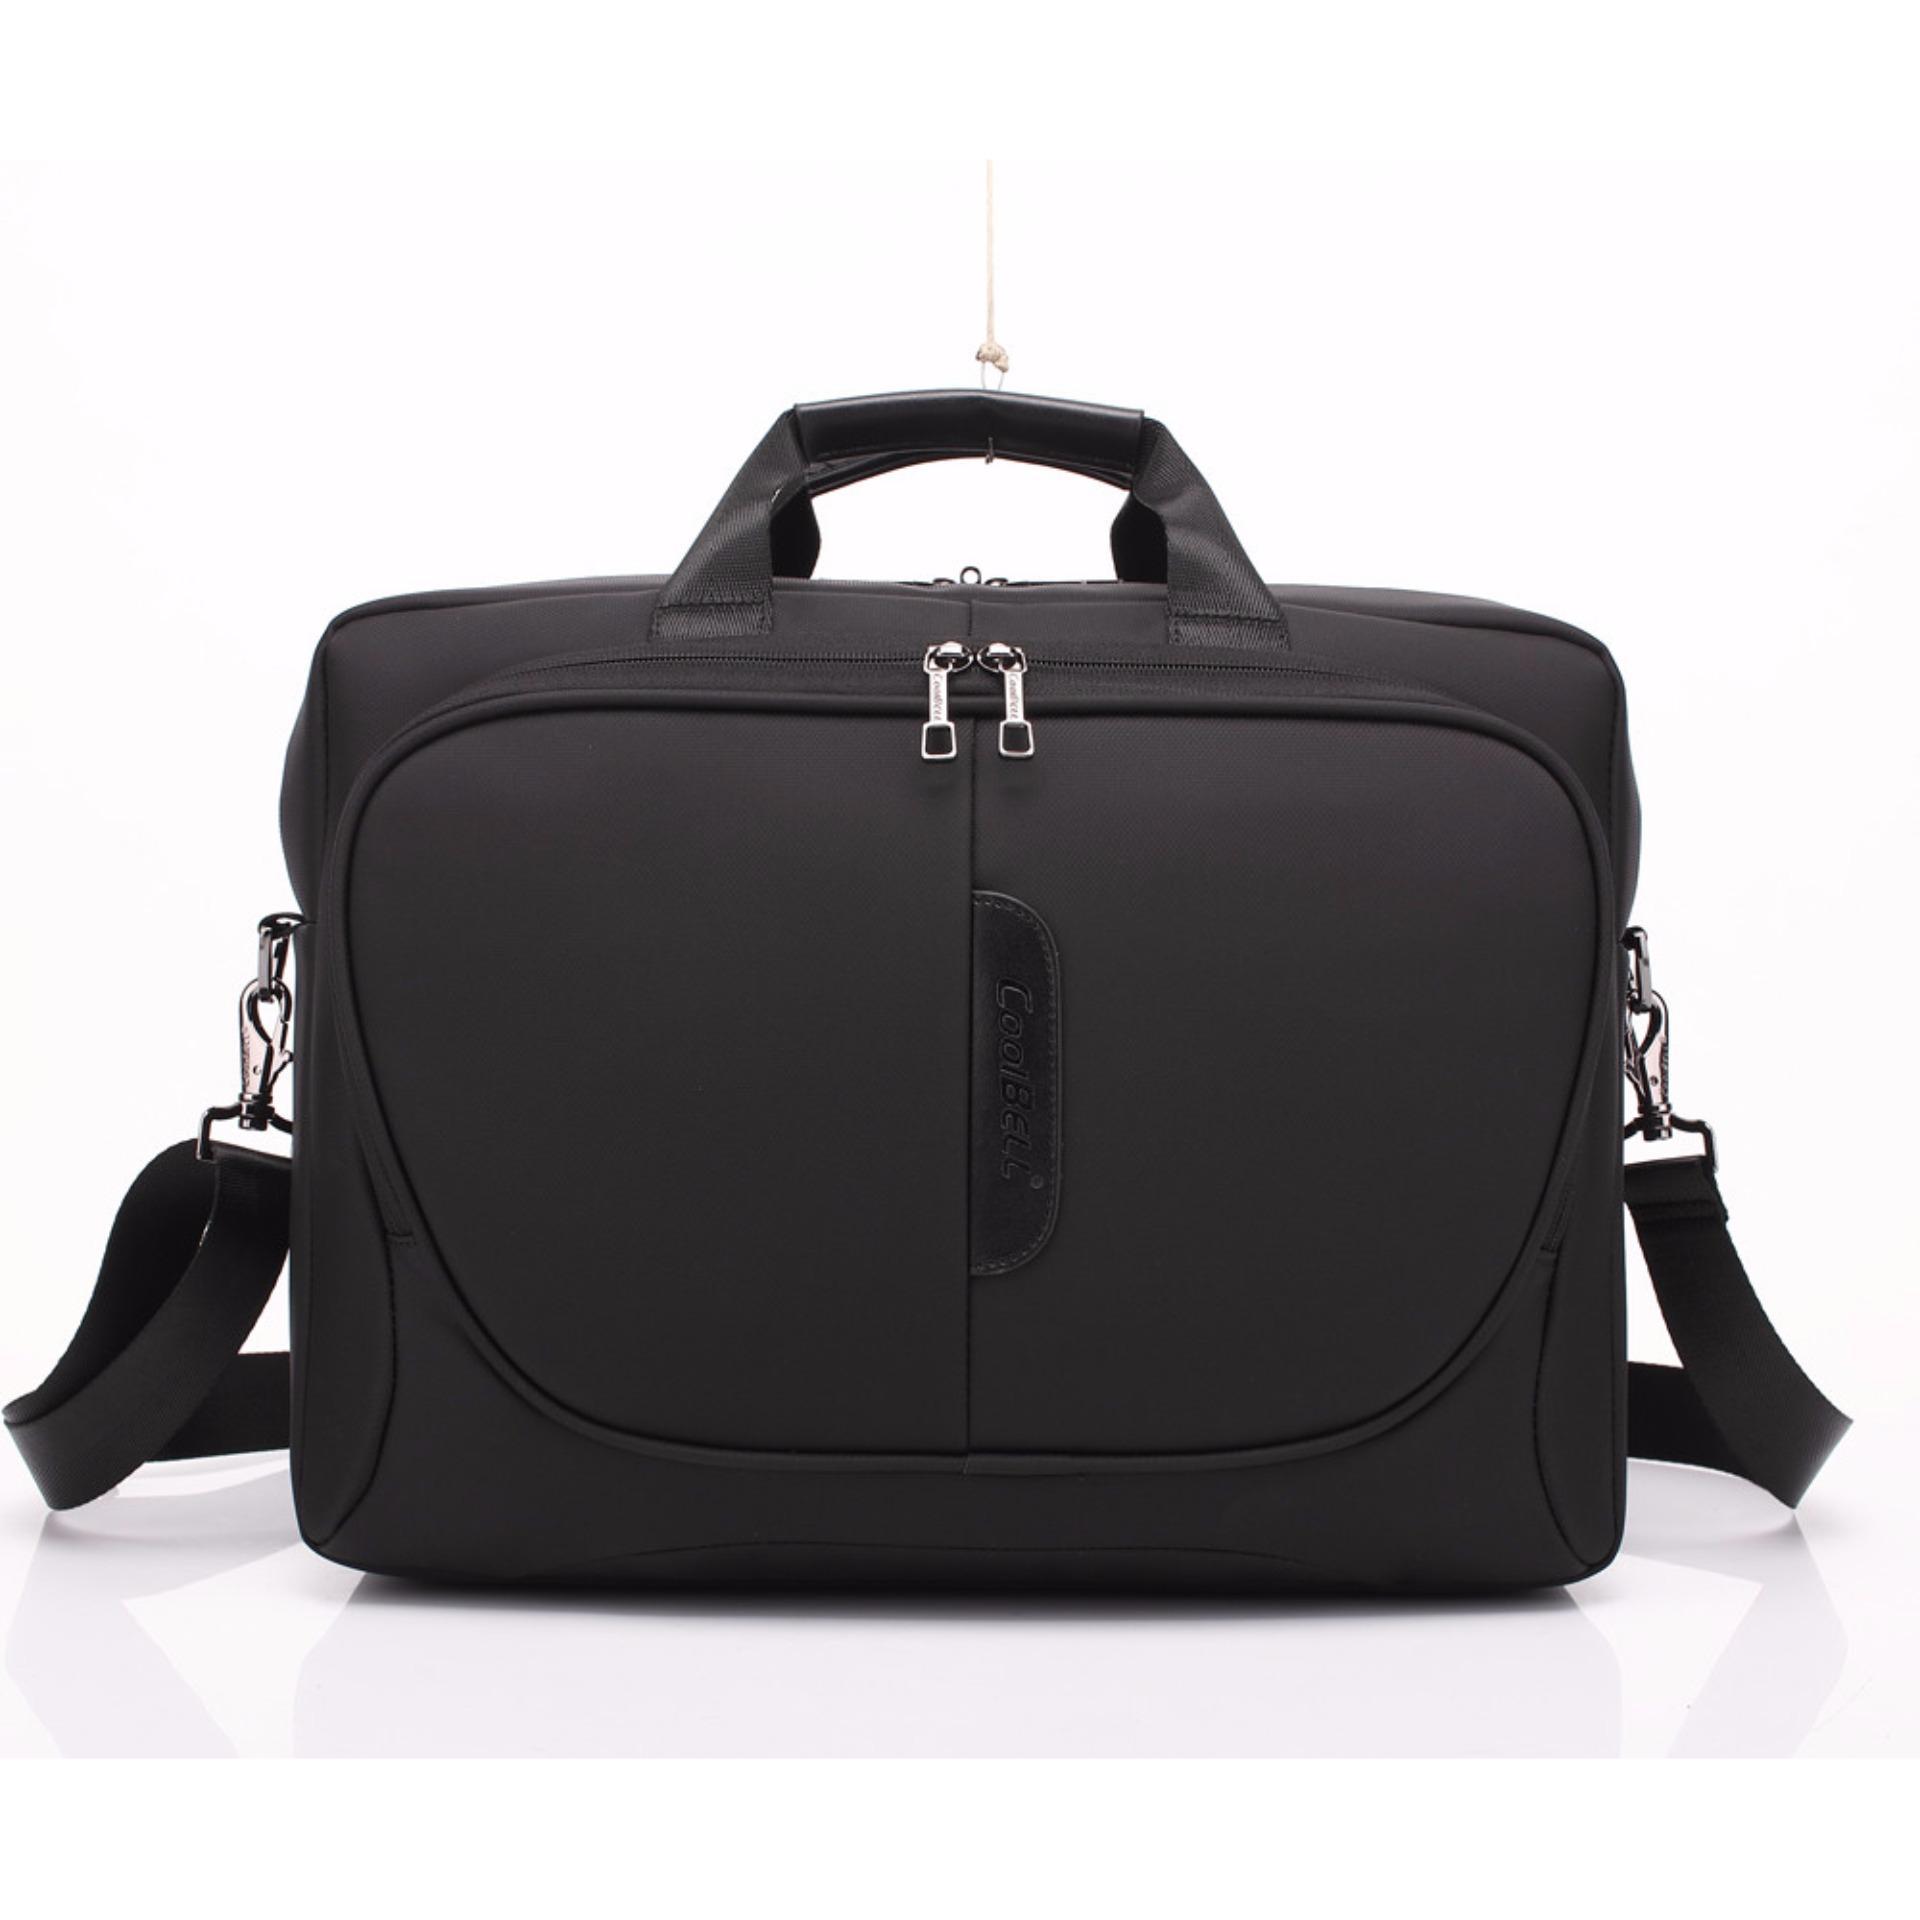 Gearmax 15 6 Inch Waterproof Canvas Nylon Oxford Business Laptop Bag Original Premium Gm39061 154 Snowflakes Fabrics Ox Coolbell Cb 5001 156 Backpack Unisex Hitam